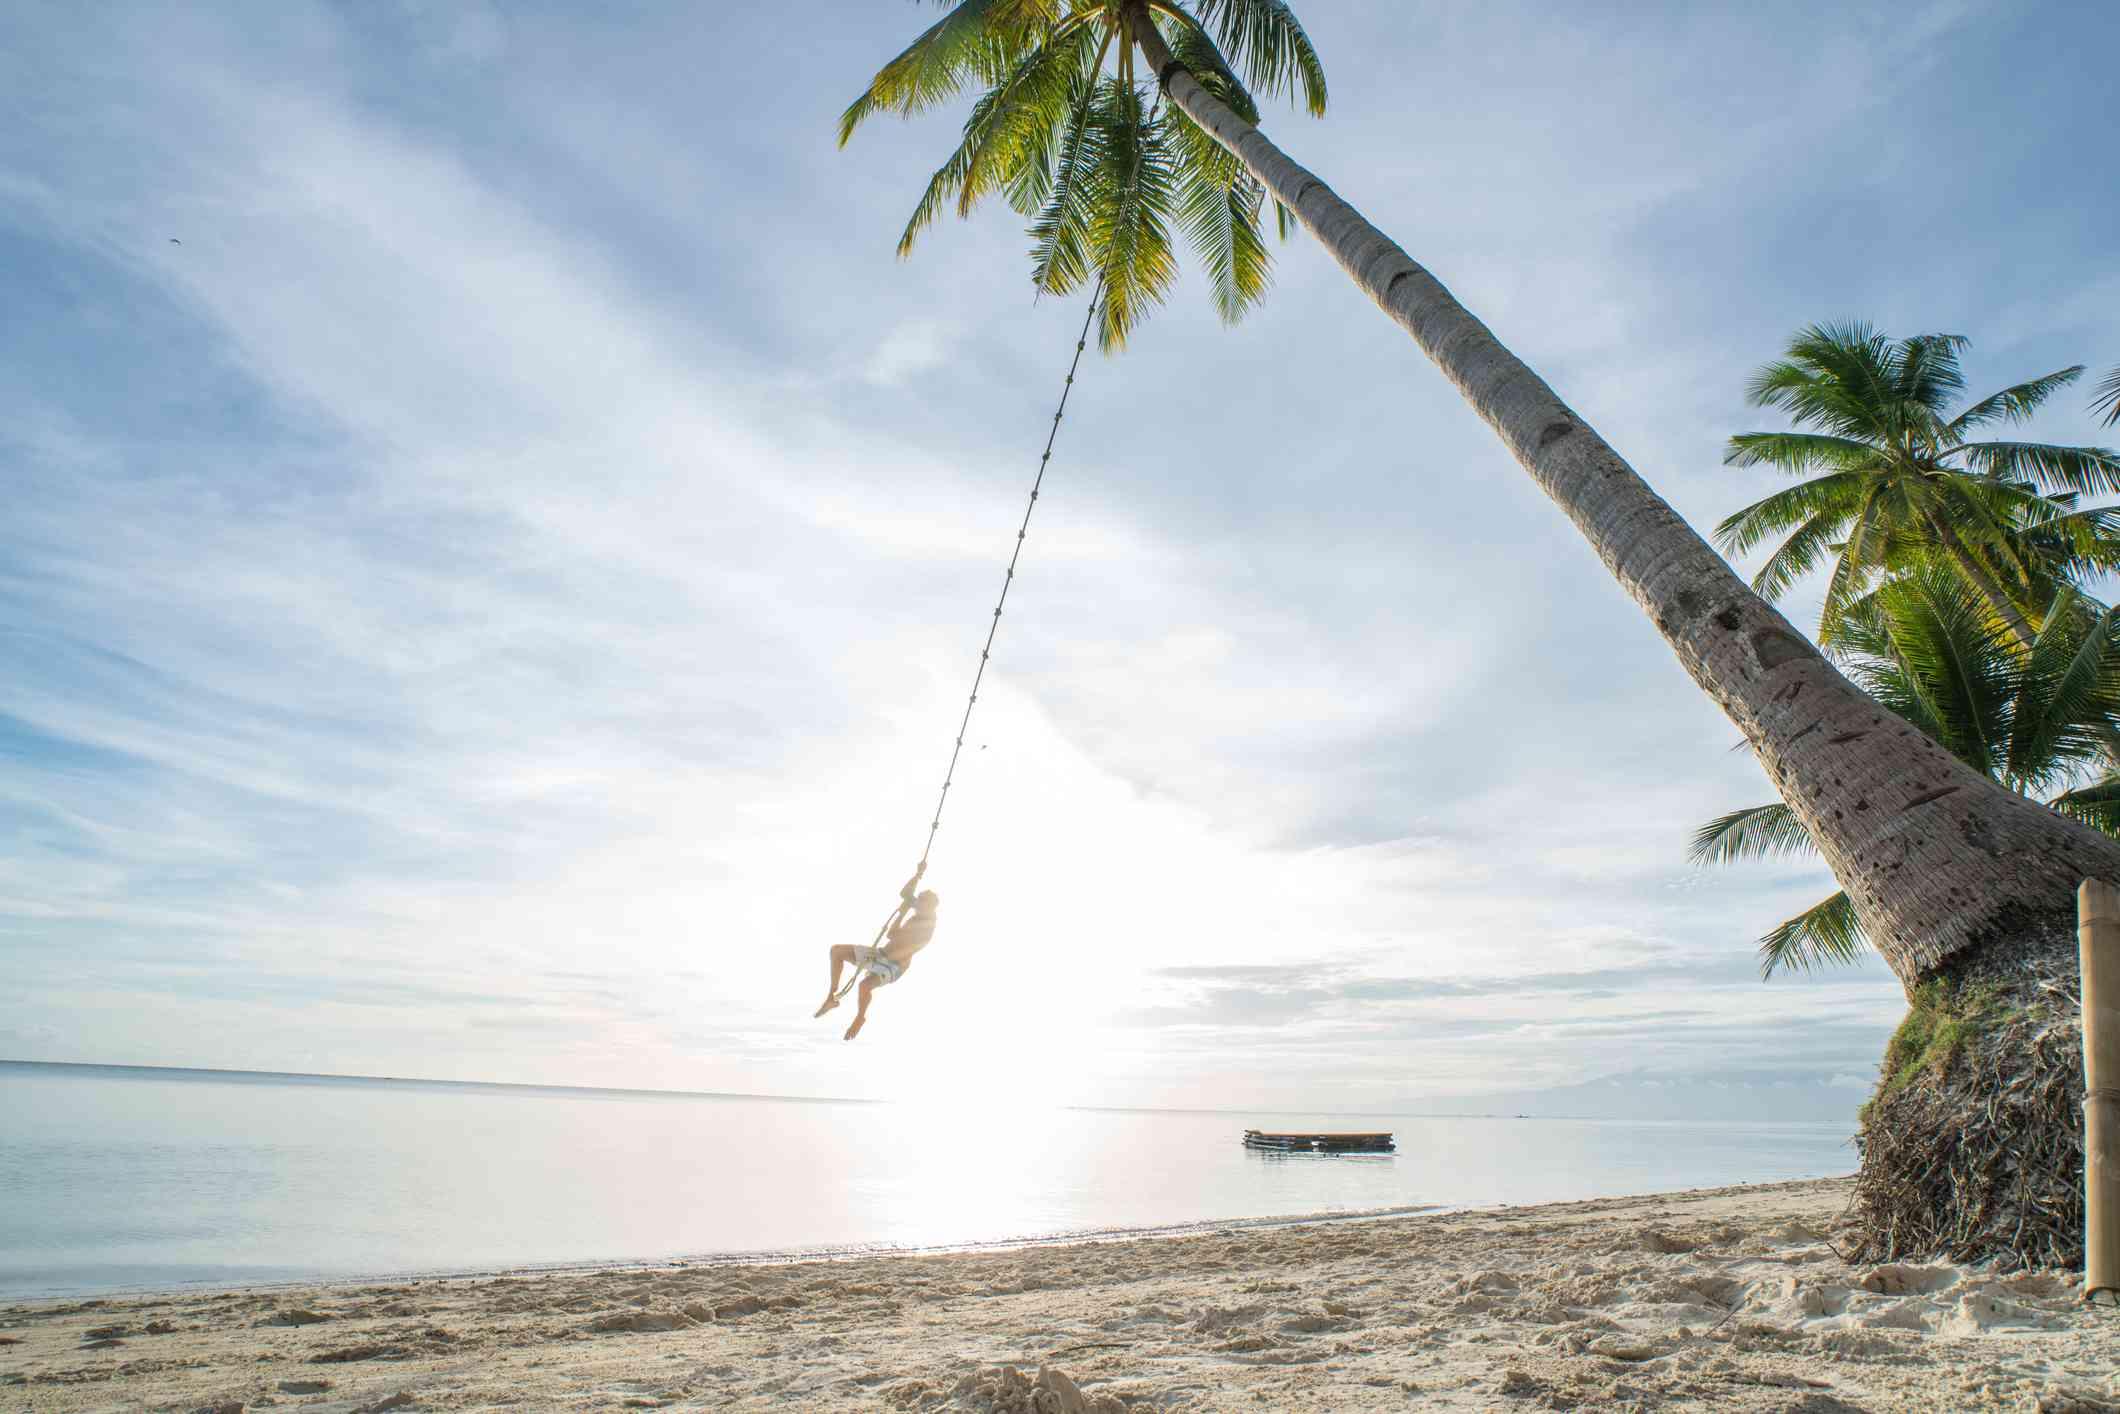 Beach swing on Siquijor Island